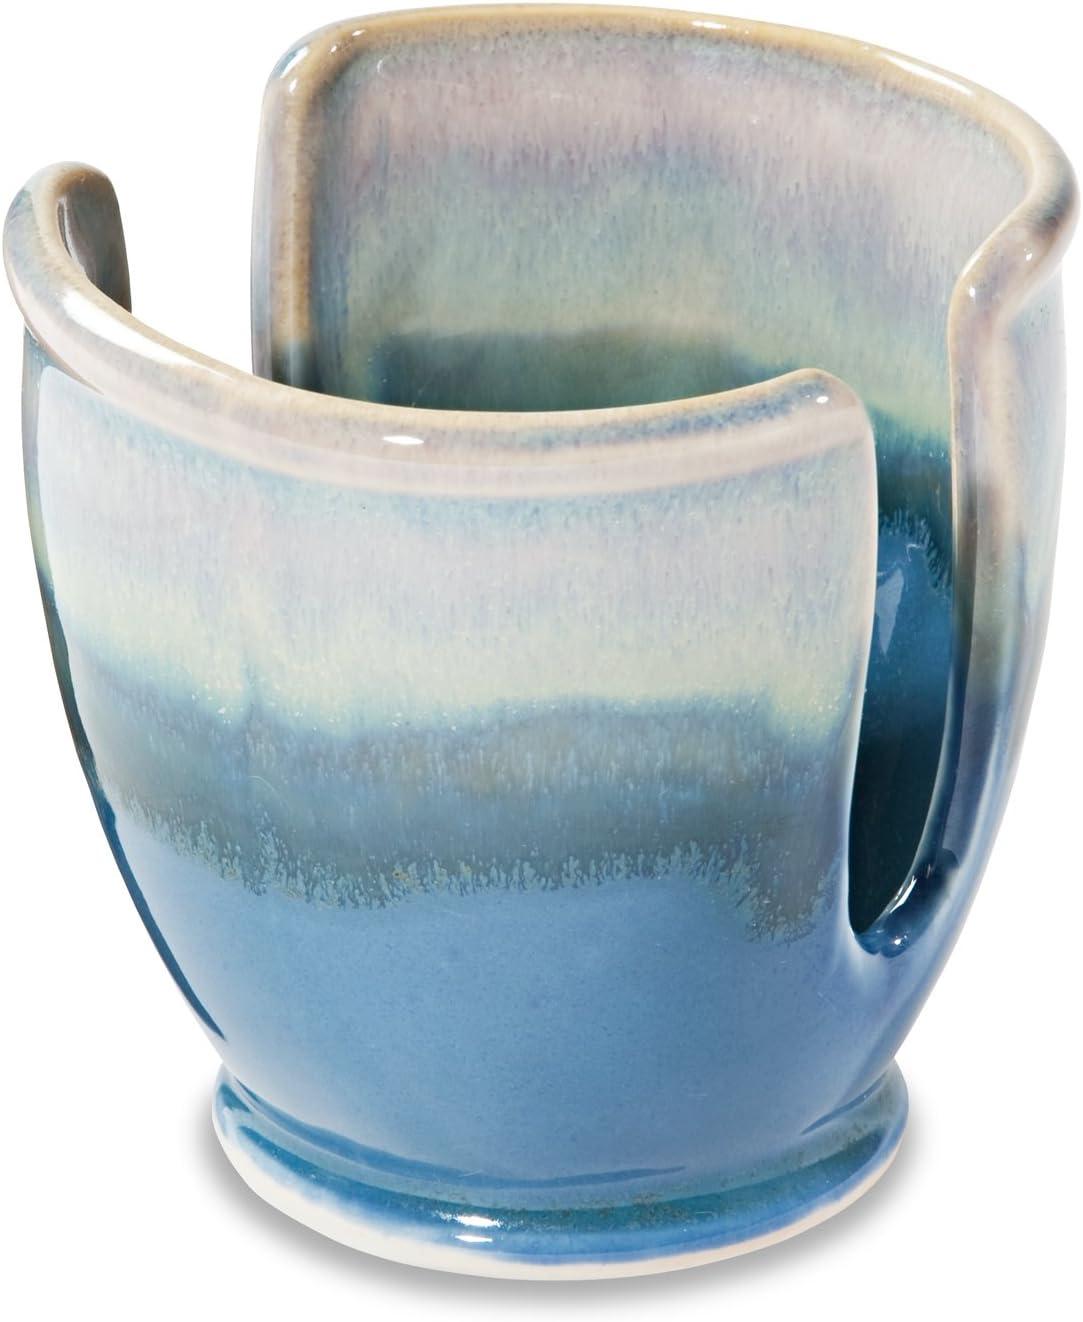 Georgetown Pottery Sponge Holder Blue - Oribe Milwaukee Mall Purple price